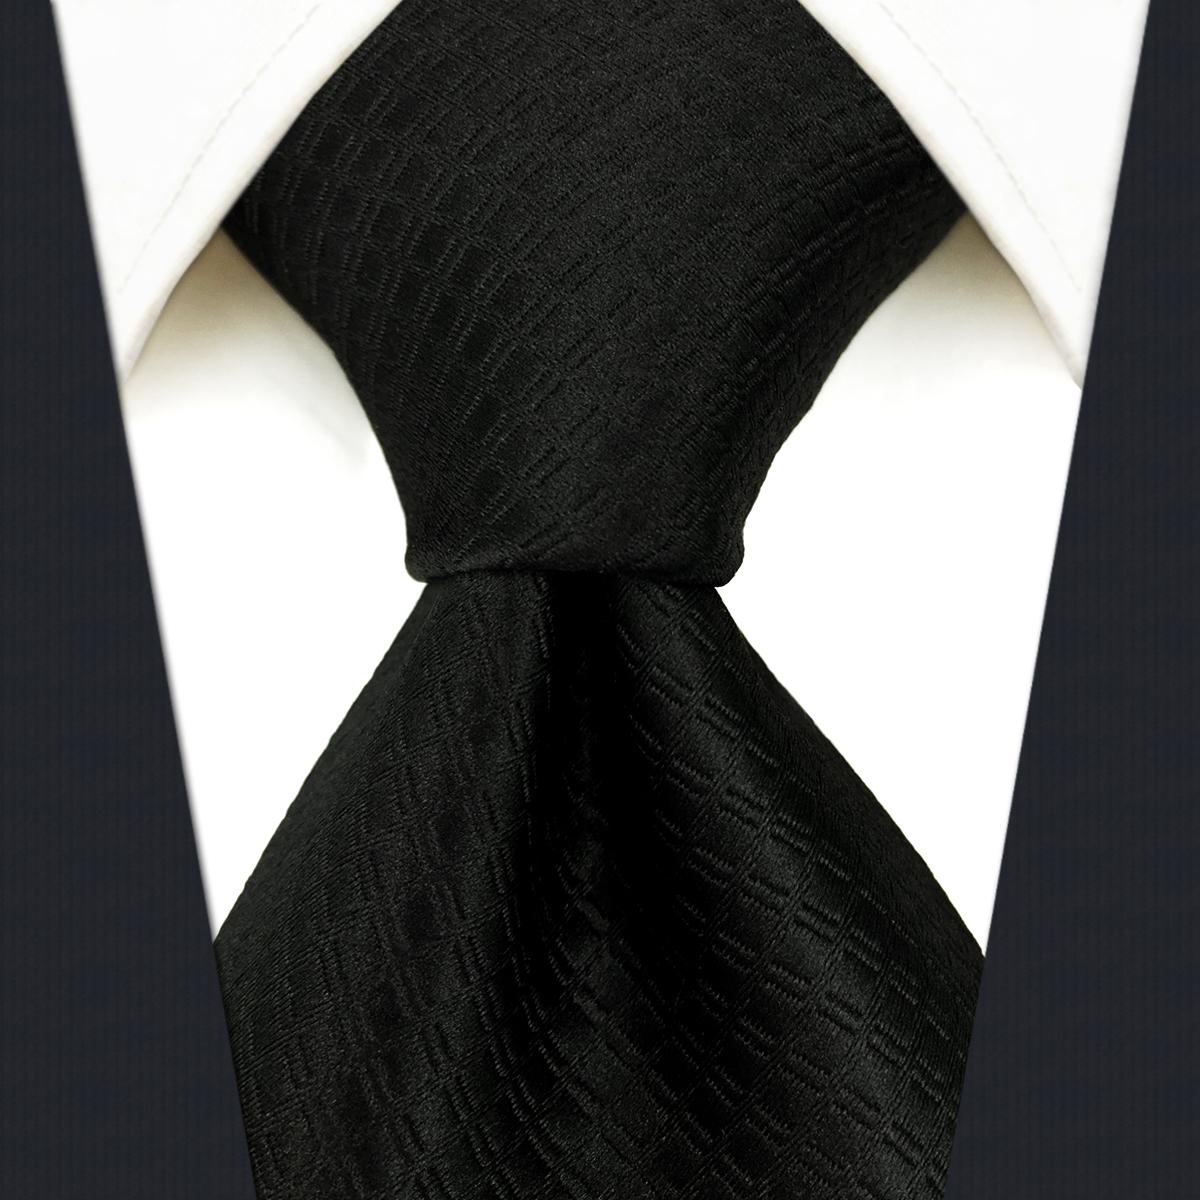 Solid black mens tie formal dress business fashion Korean version British hand tie 8cm tie package mail gift box